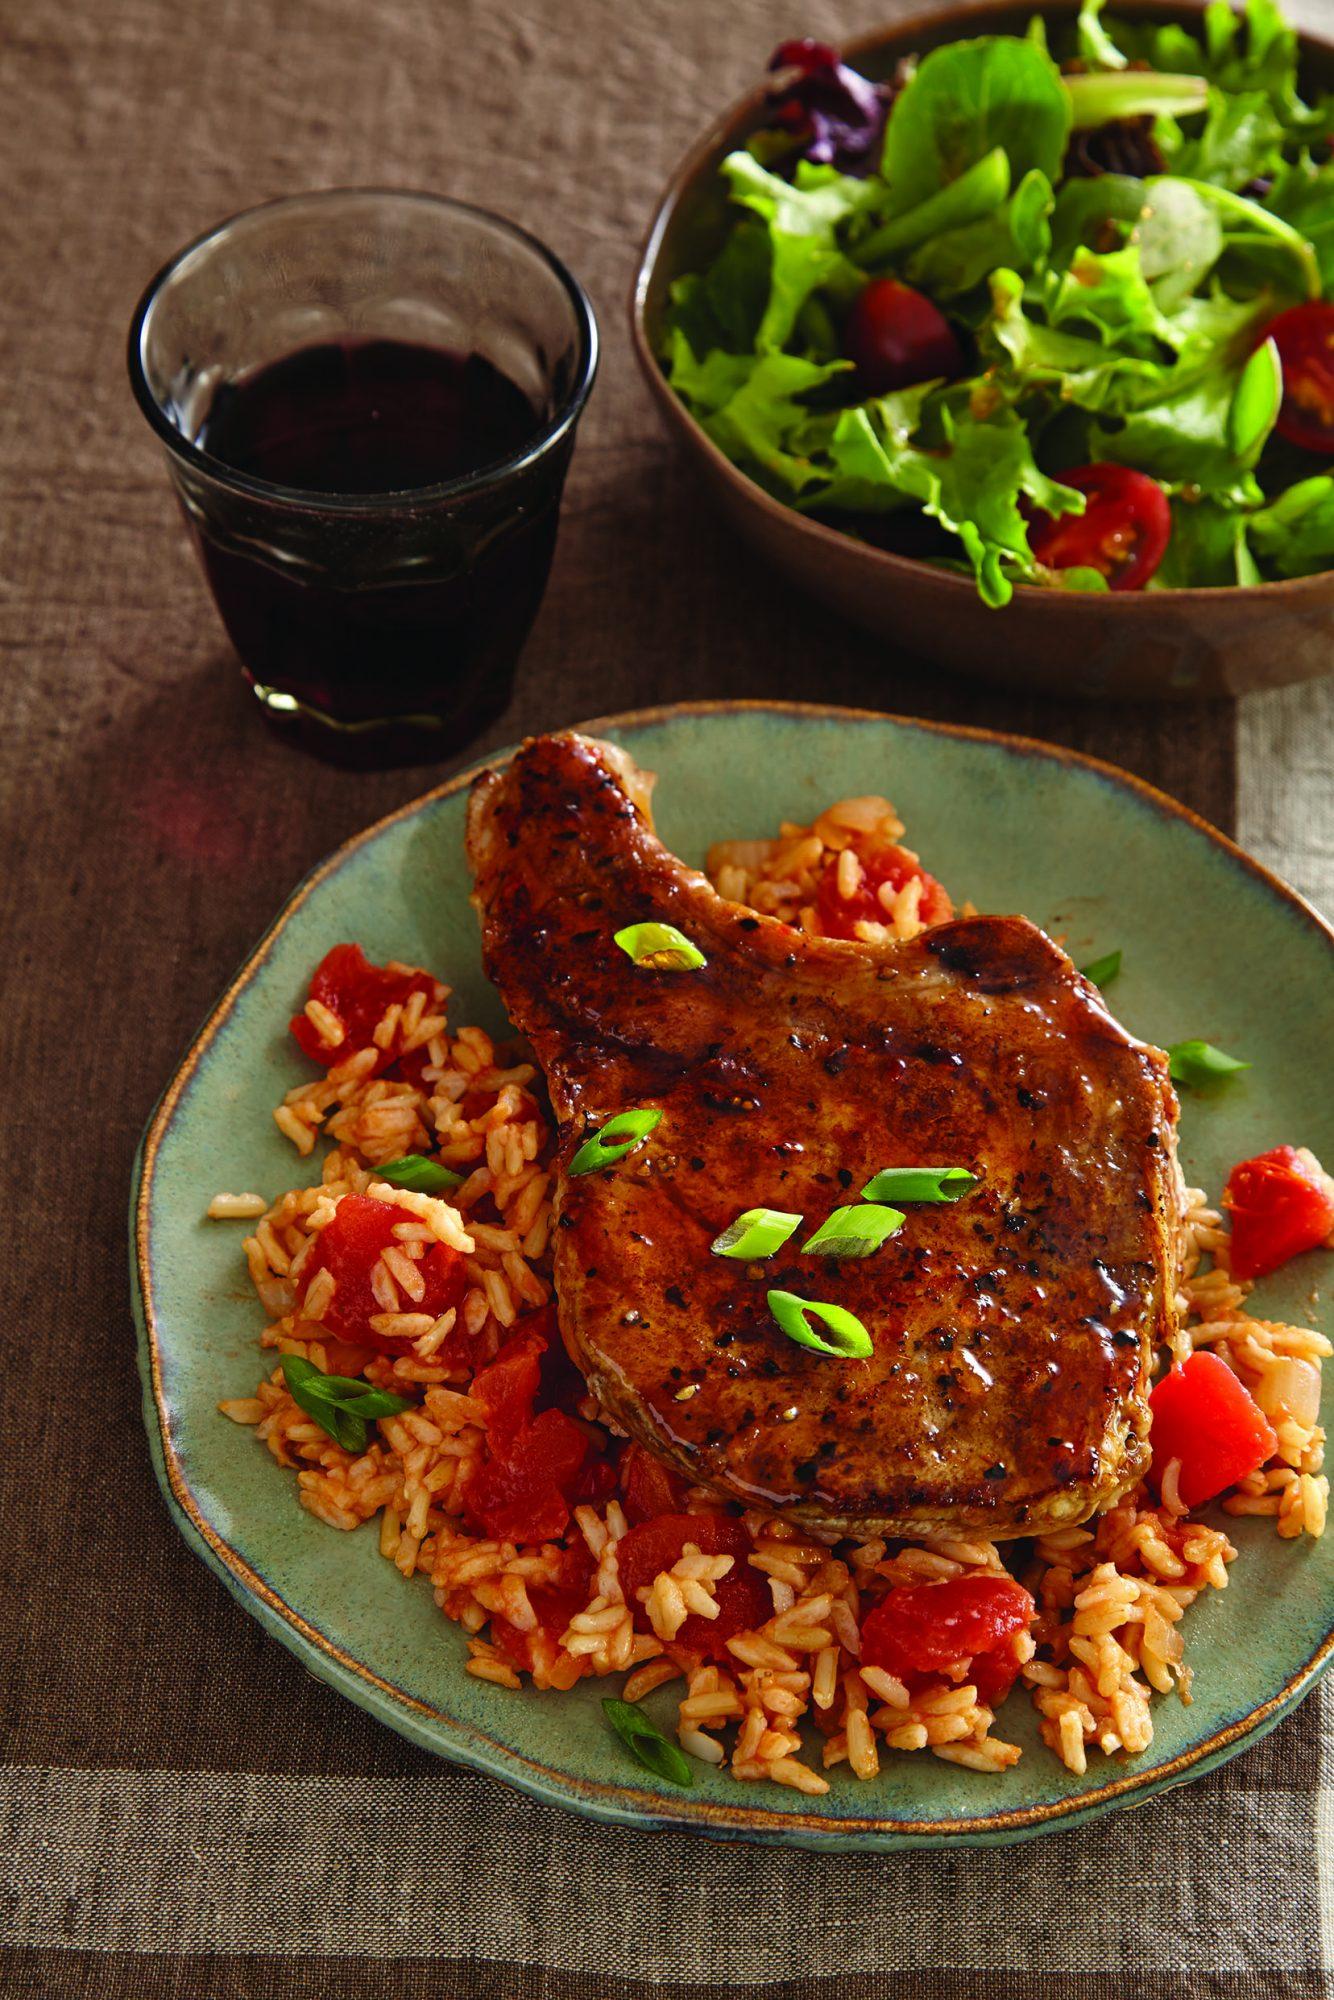 Jalapeño-Glazed Pork Chops and Rice